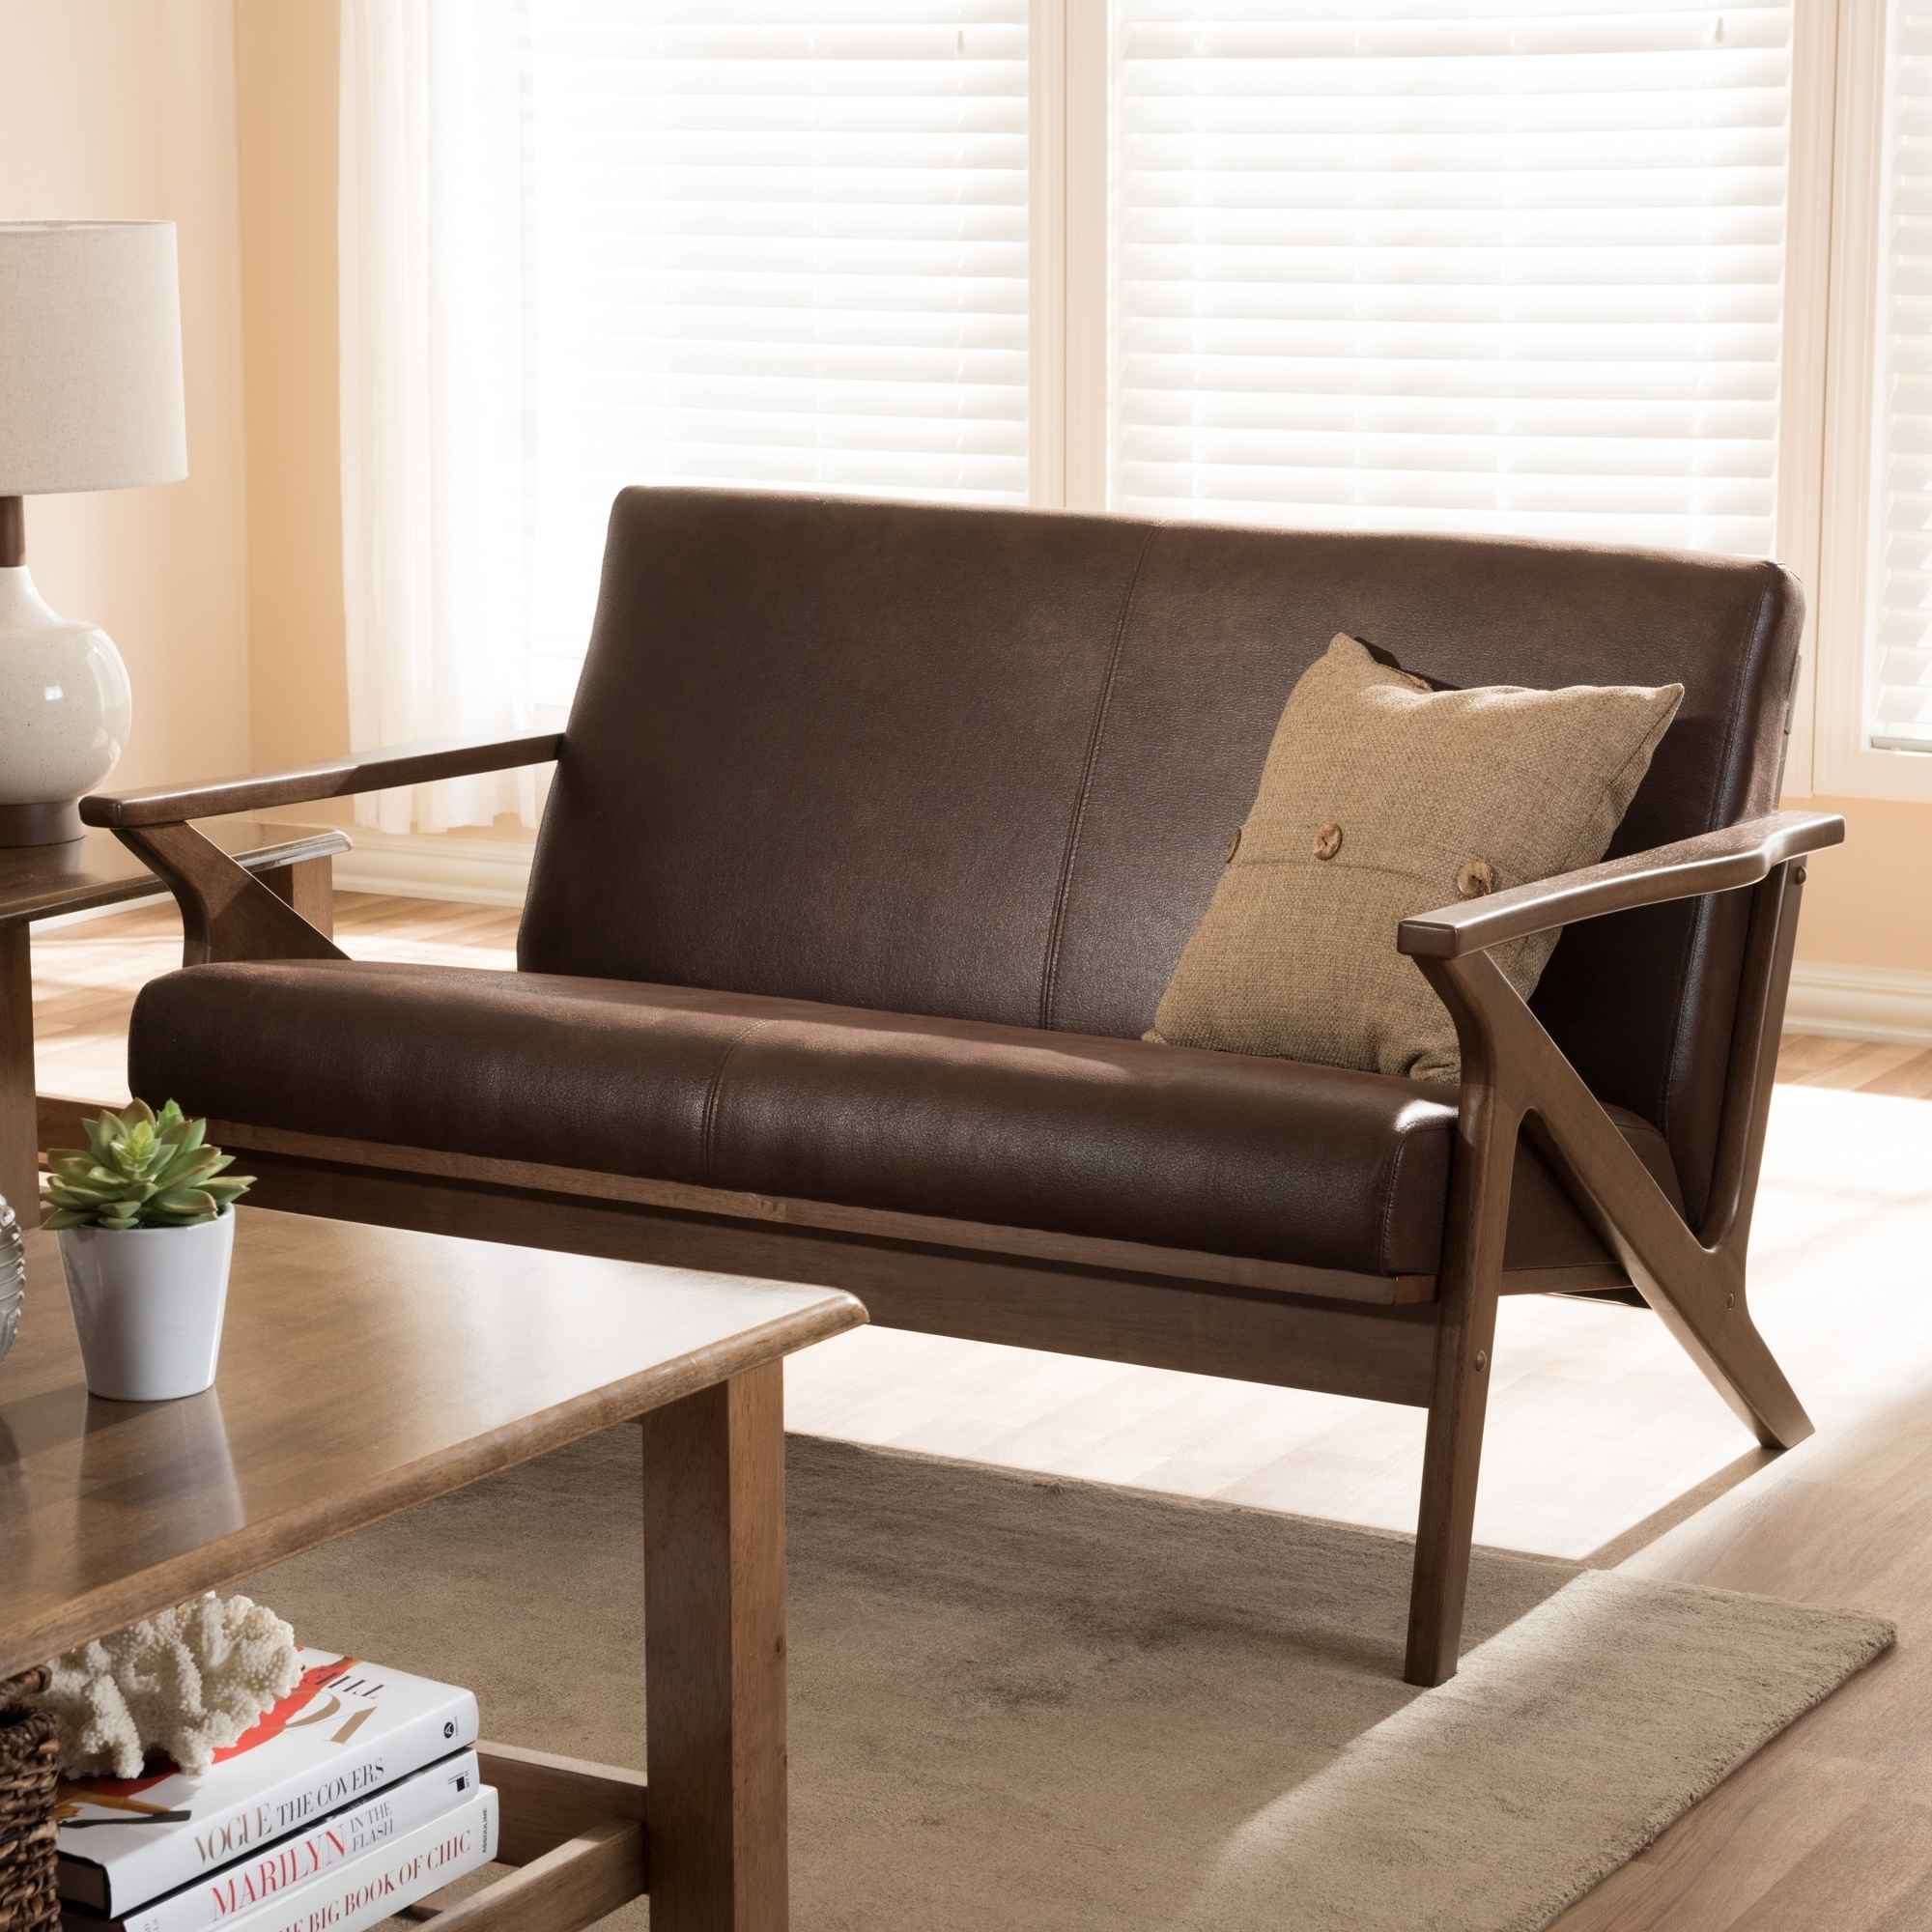 Amazing Details About Mid Century Loveseat By Baxton Studio Creativecarmelina Interior Chair Design Creativecarmelinacom